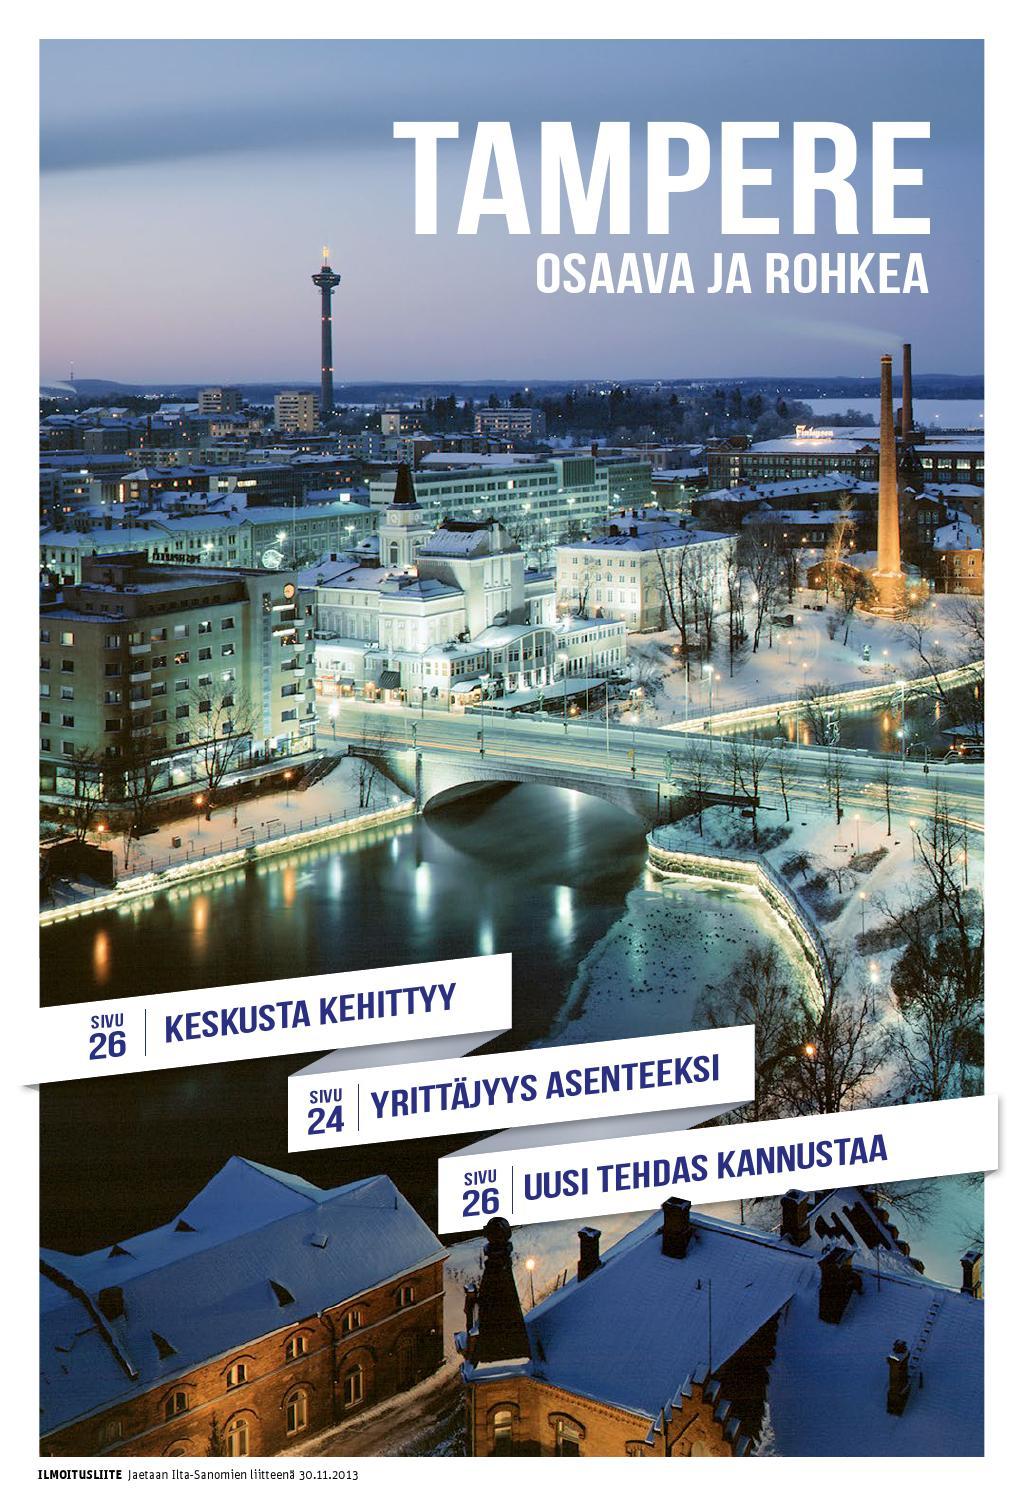 Tampereen kaupungin erikoisjulkaisu 2013 by Crossmedia Communications Finland - Issuu